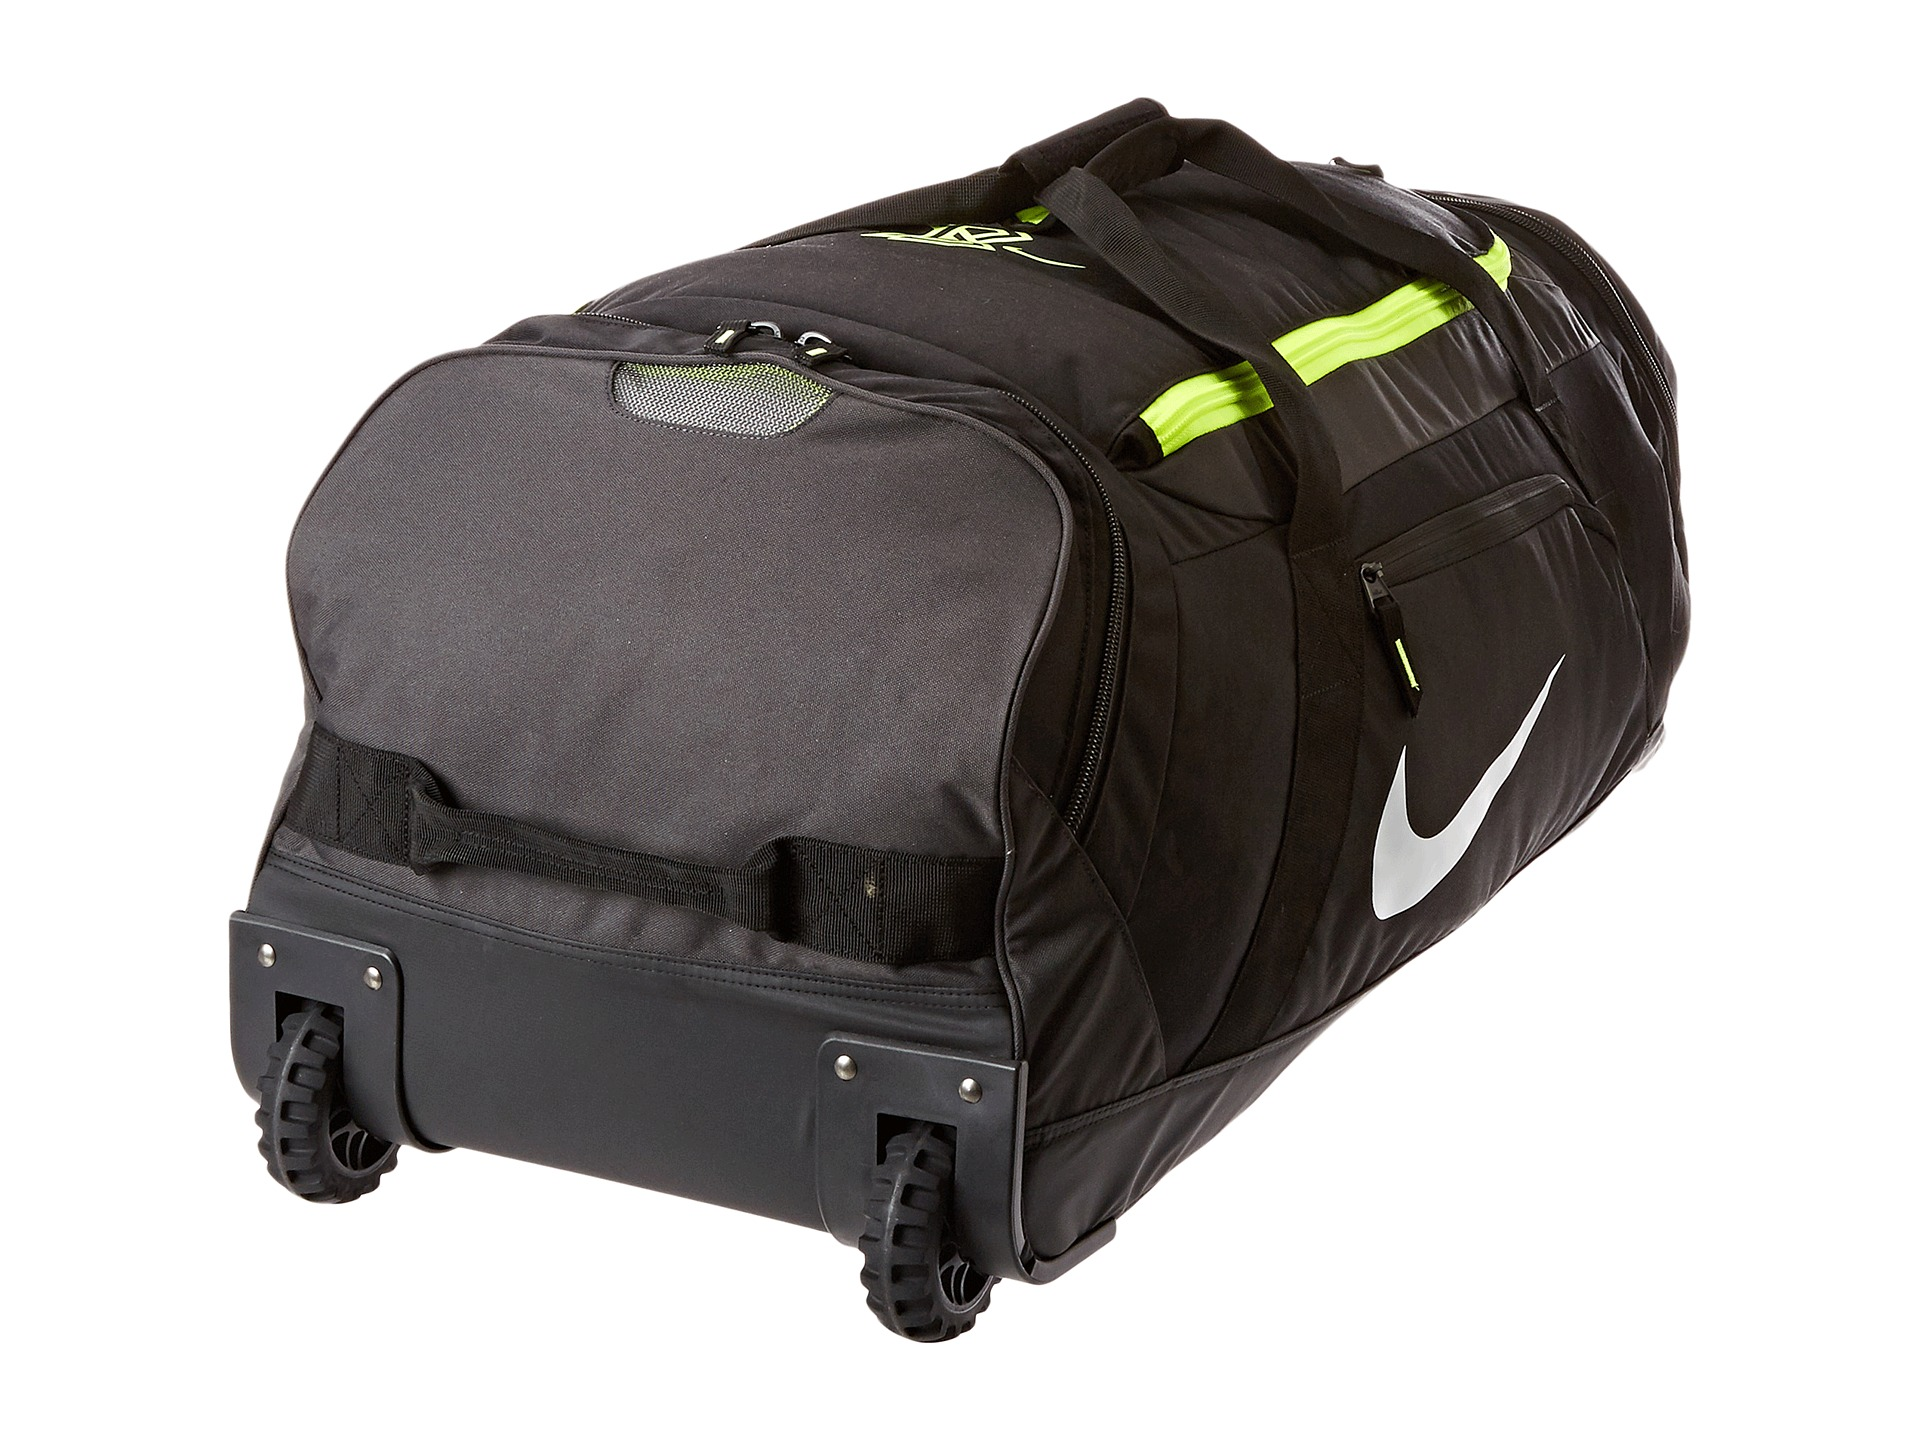 Nike Travel Bag With Wheels